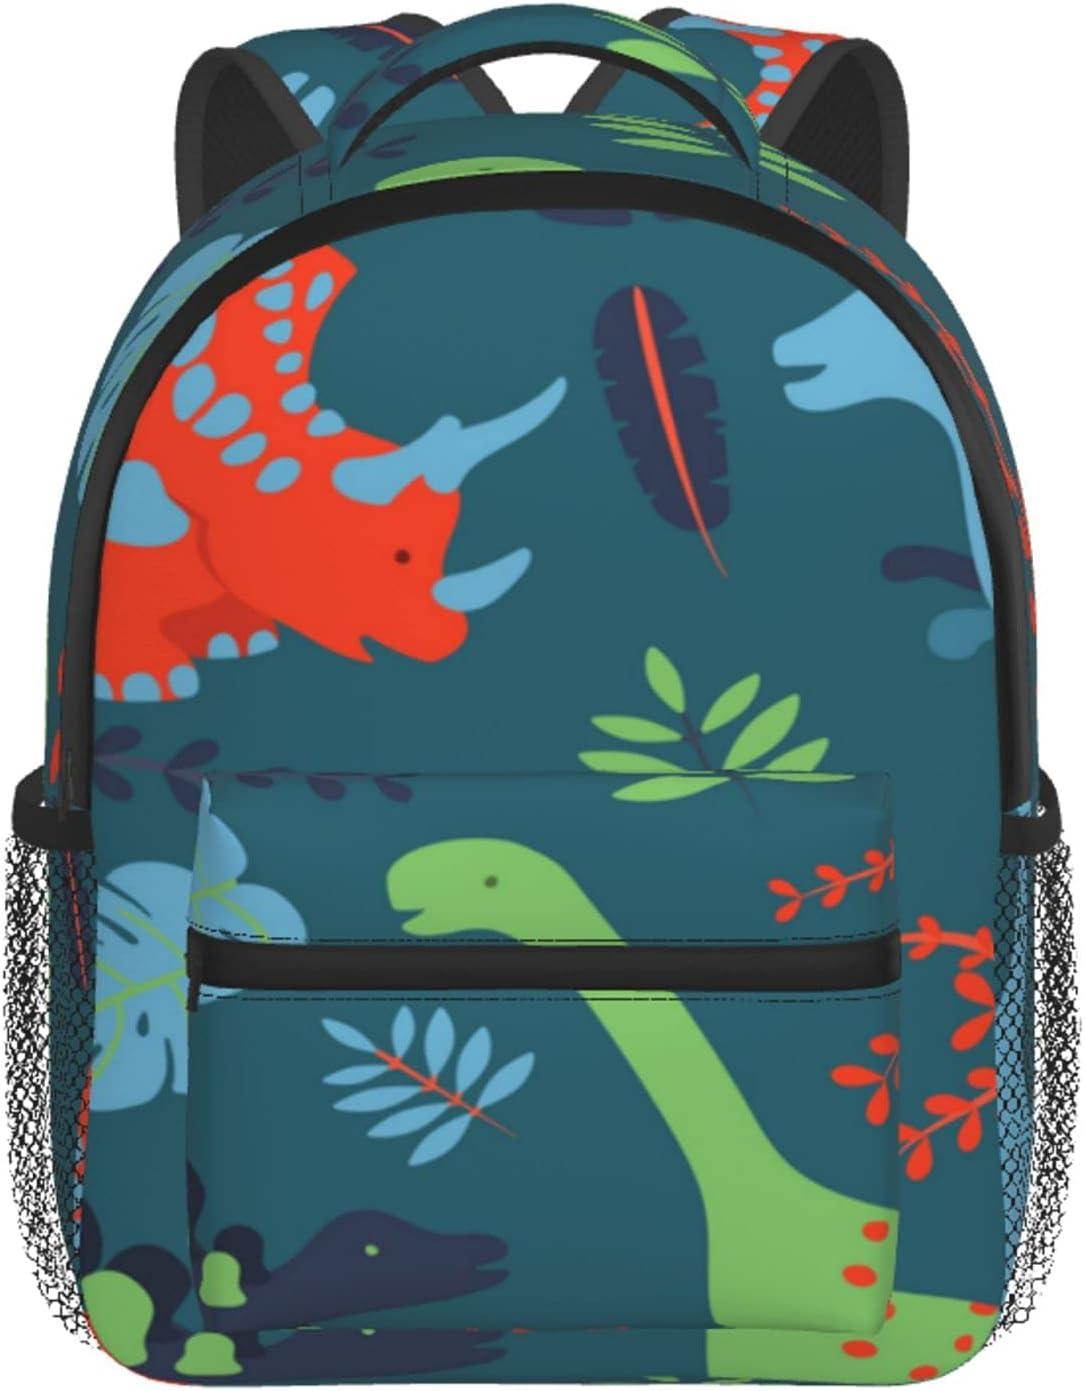 Tucson Mall N\C Backpack for Boys Girls Ranking TOP18 Kinder Backpacks Kids Preschool